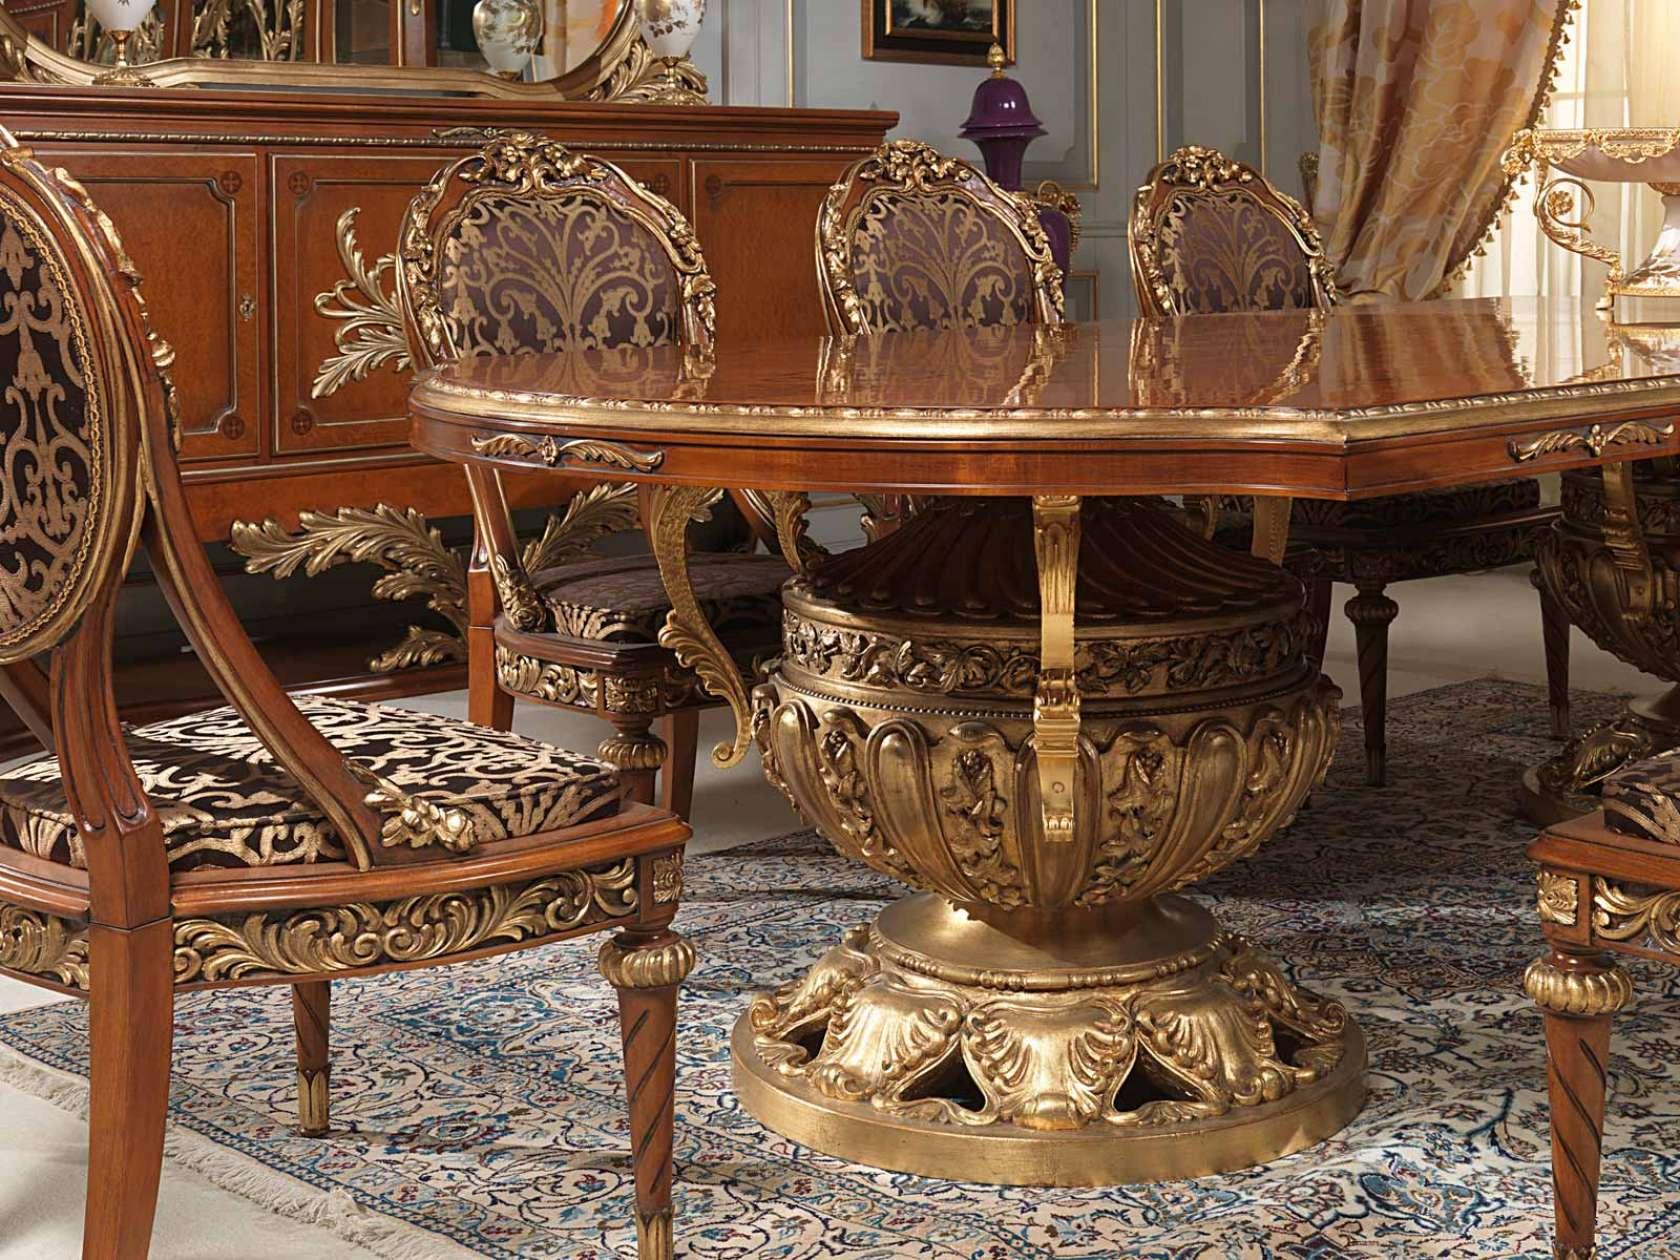 Tavolo e sedie Versailles in stile Luigi XVI | Vimercati Meda